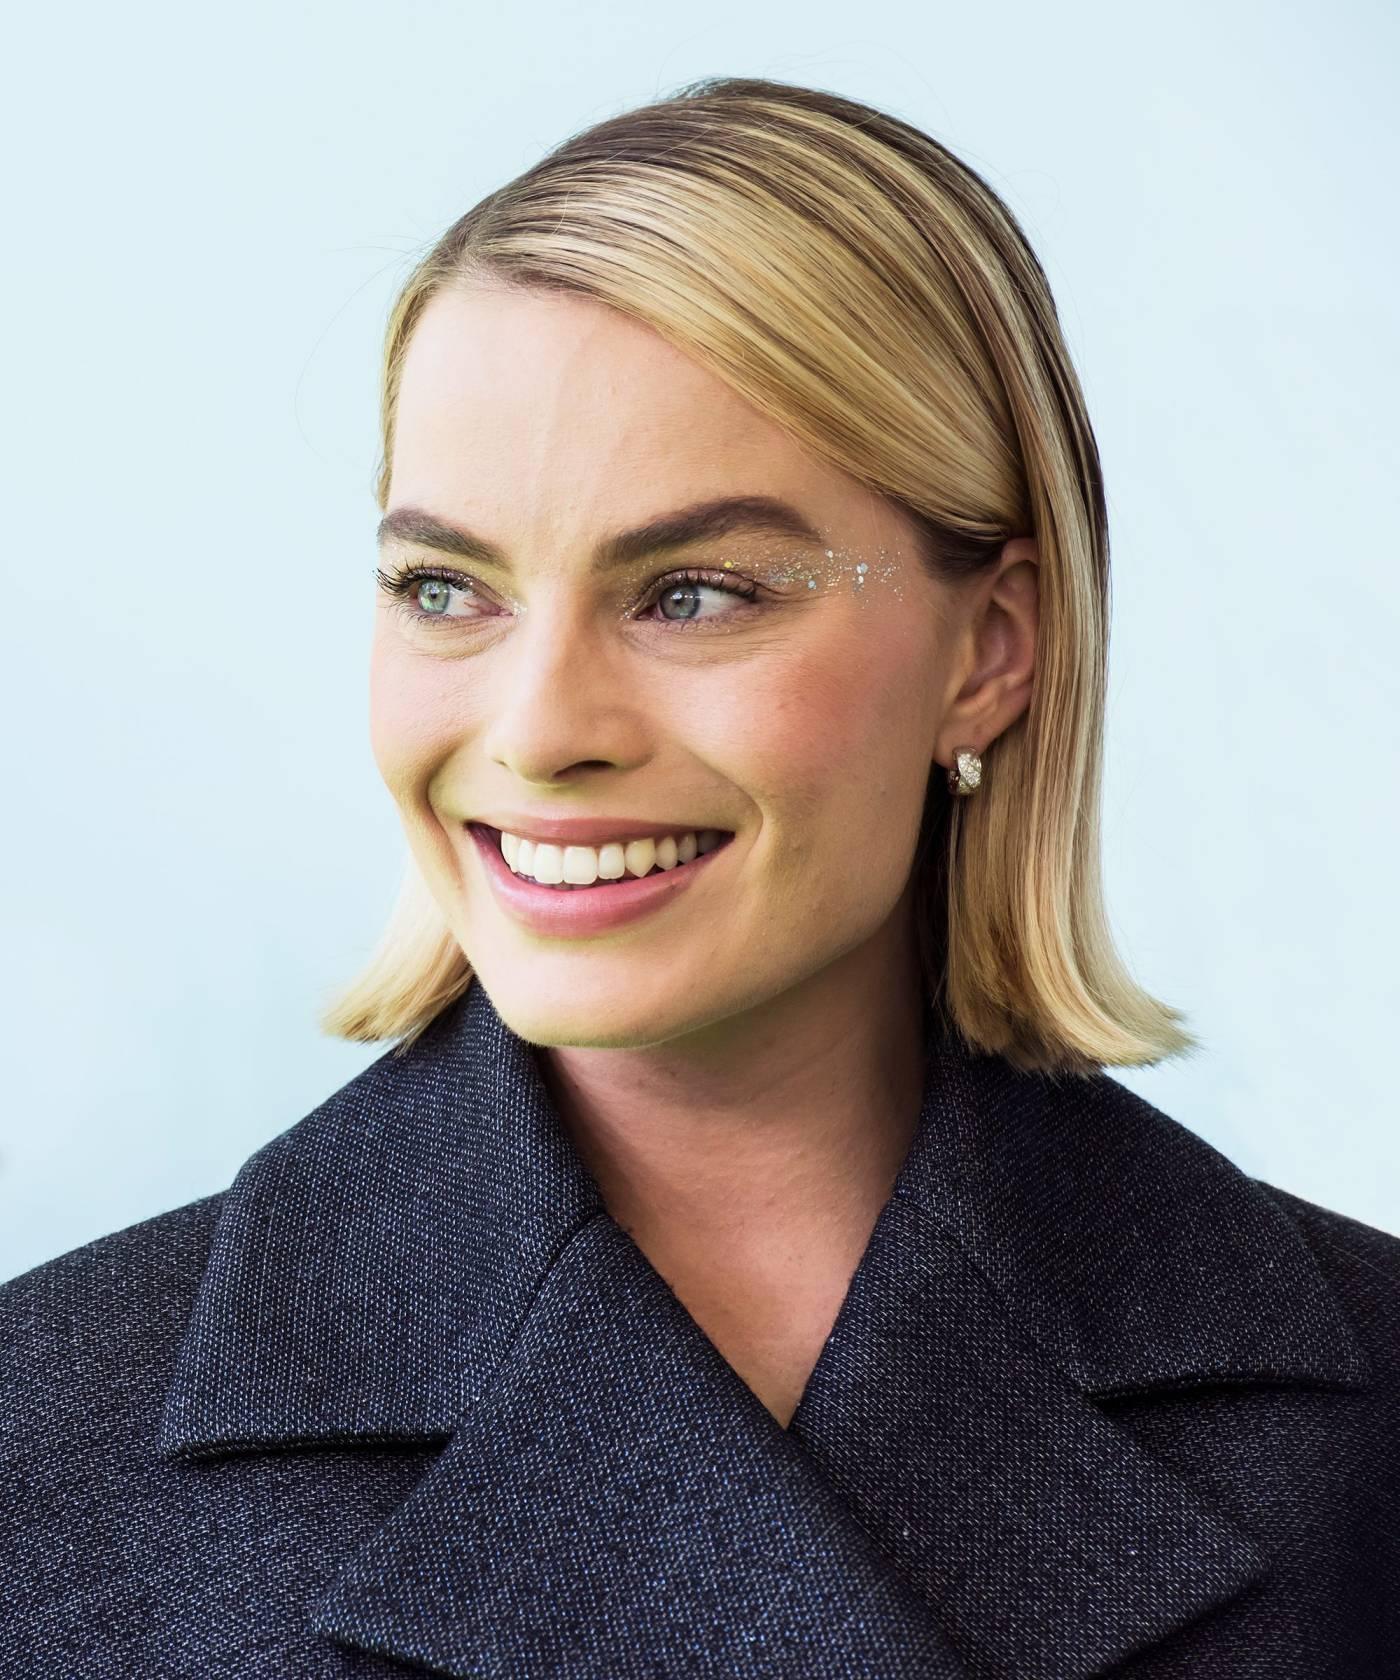 Image result for Glitter Lids: Margot Robbie makeup ideas